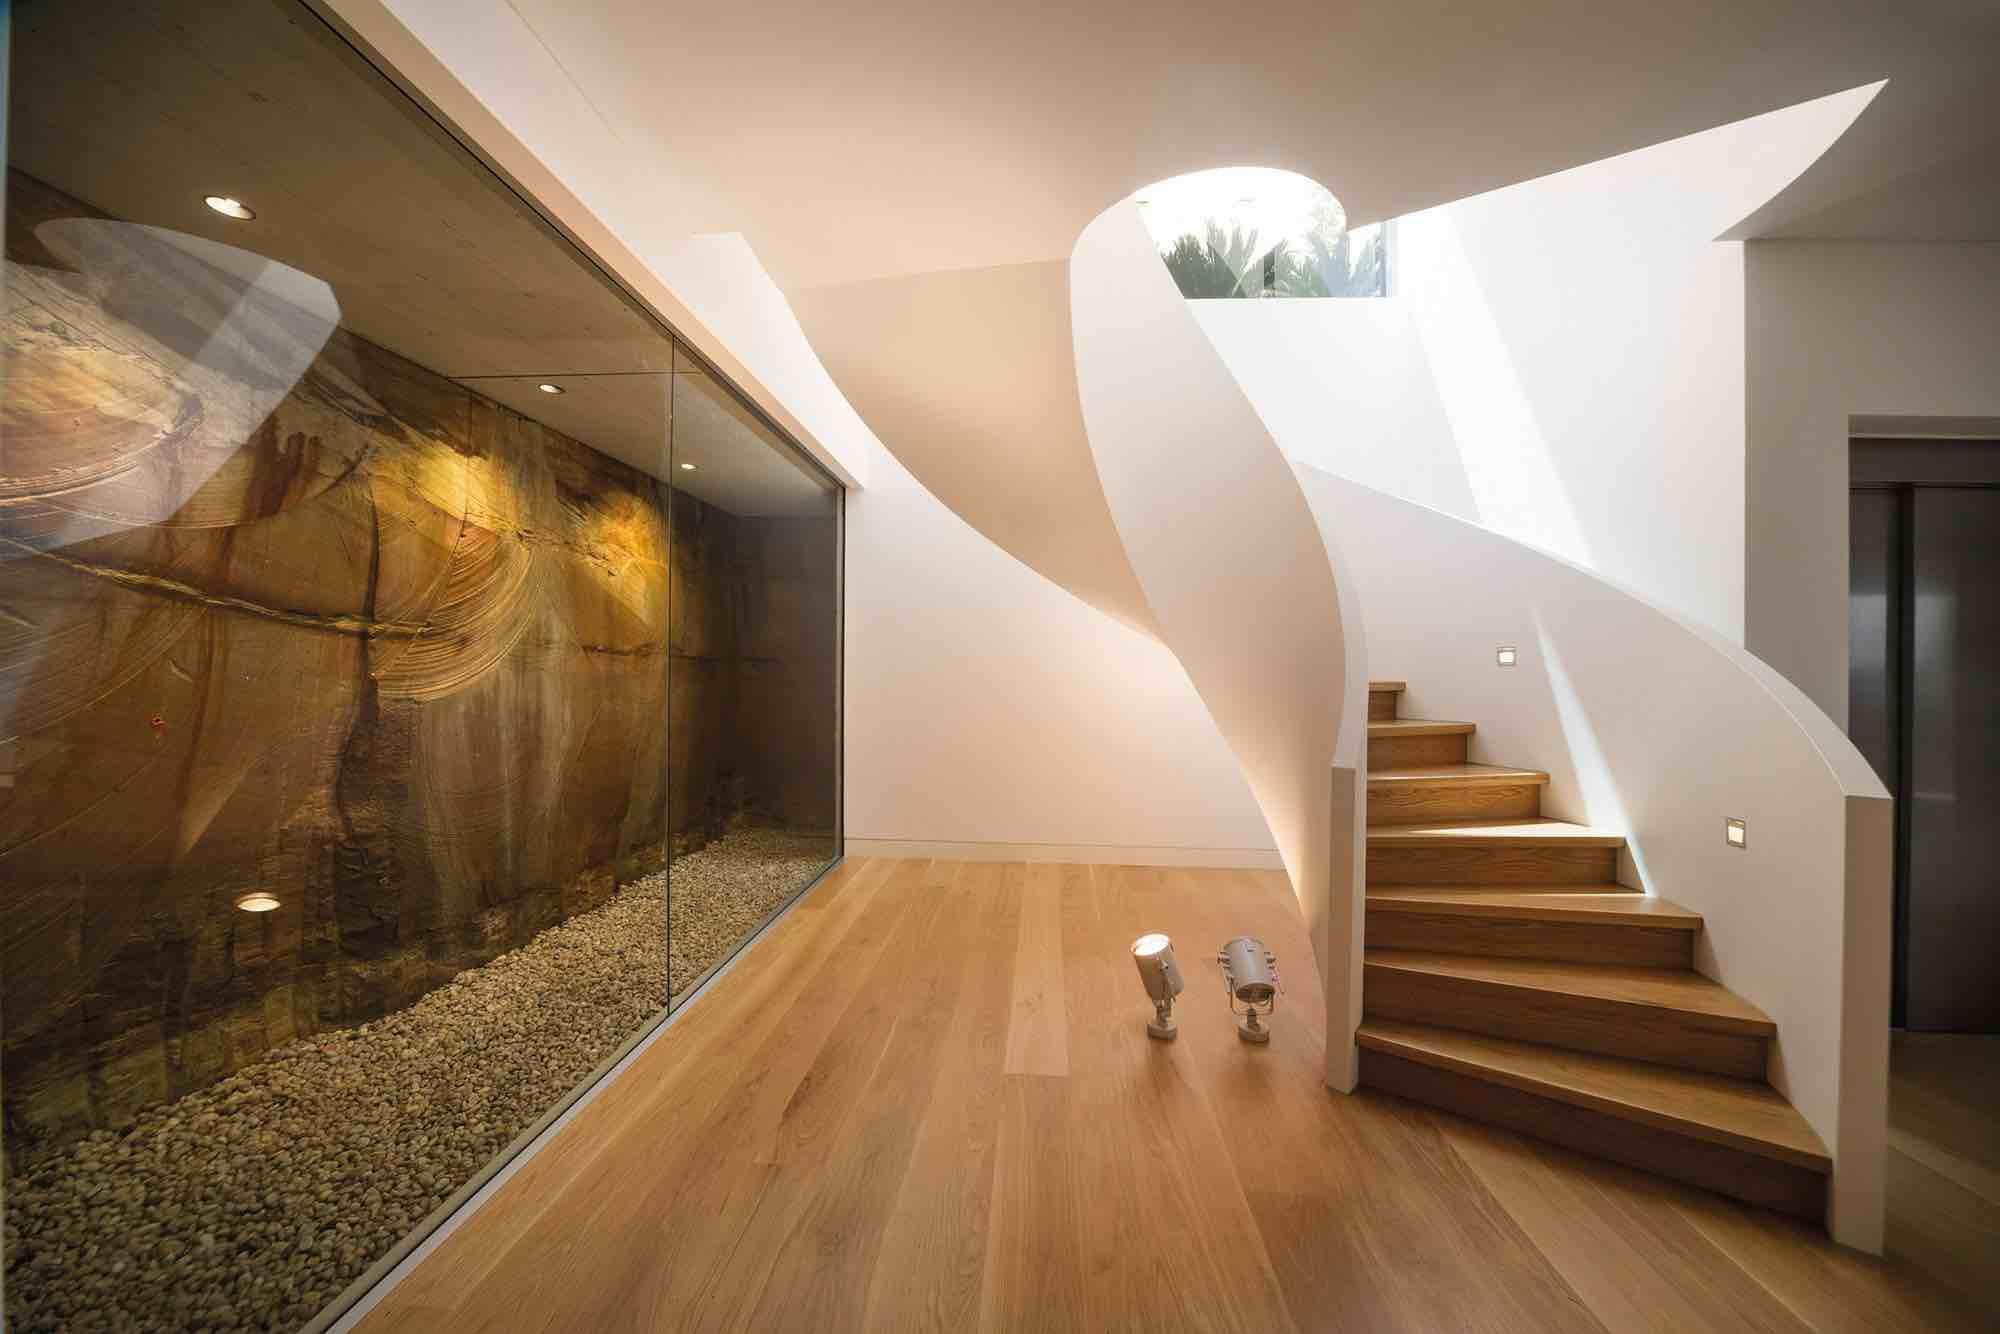 hewlett-street-house-mpr-design-group_hewlett_house04